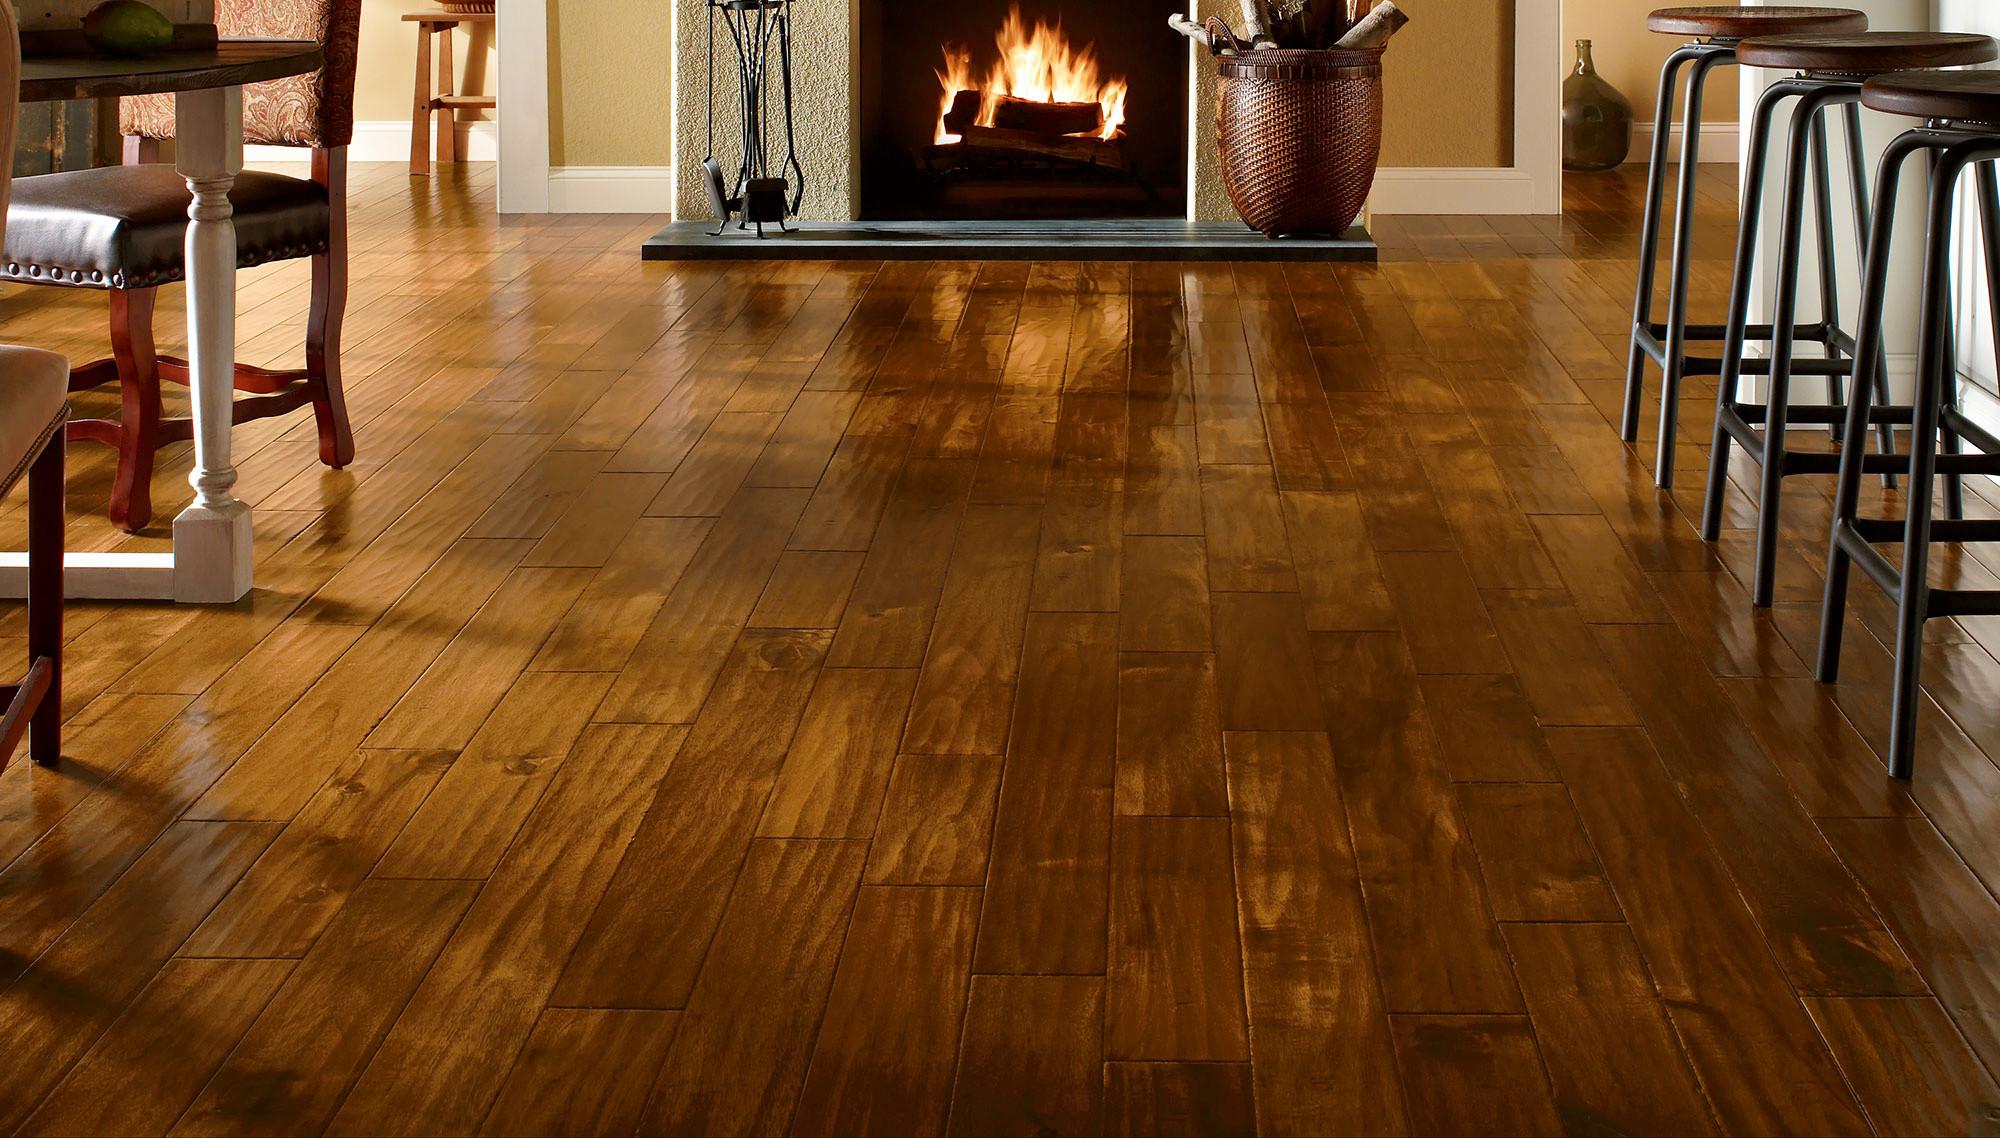 discount hardwood flooring canada of hardwood floor installation archives wlcu regarding hardwood floor designs best of appealing discount hardwood flooring 1 big kitchen floor hardwood floor